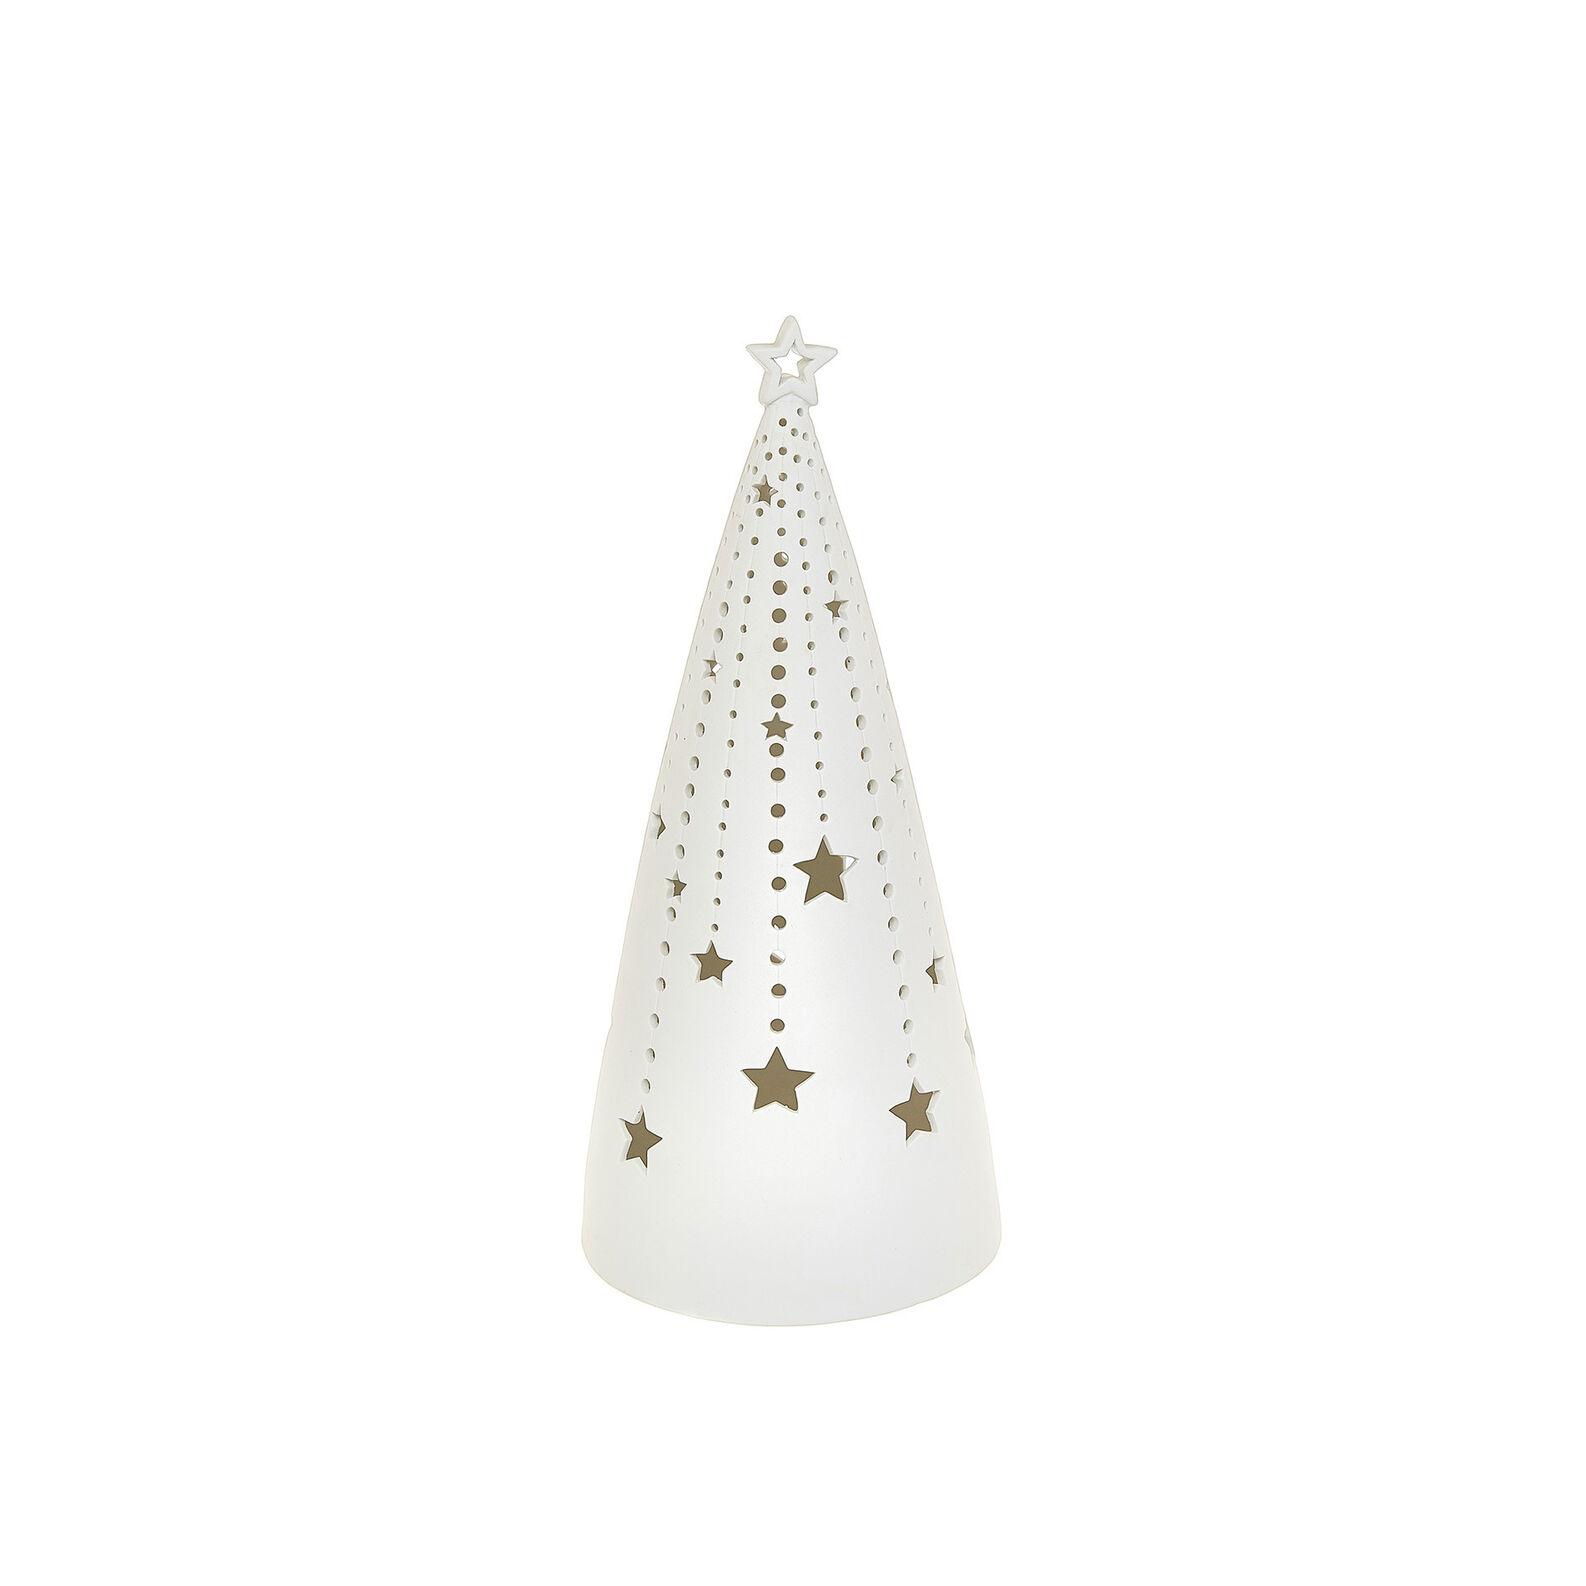 LED tree in openwork porcelain